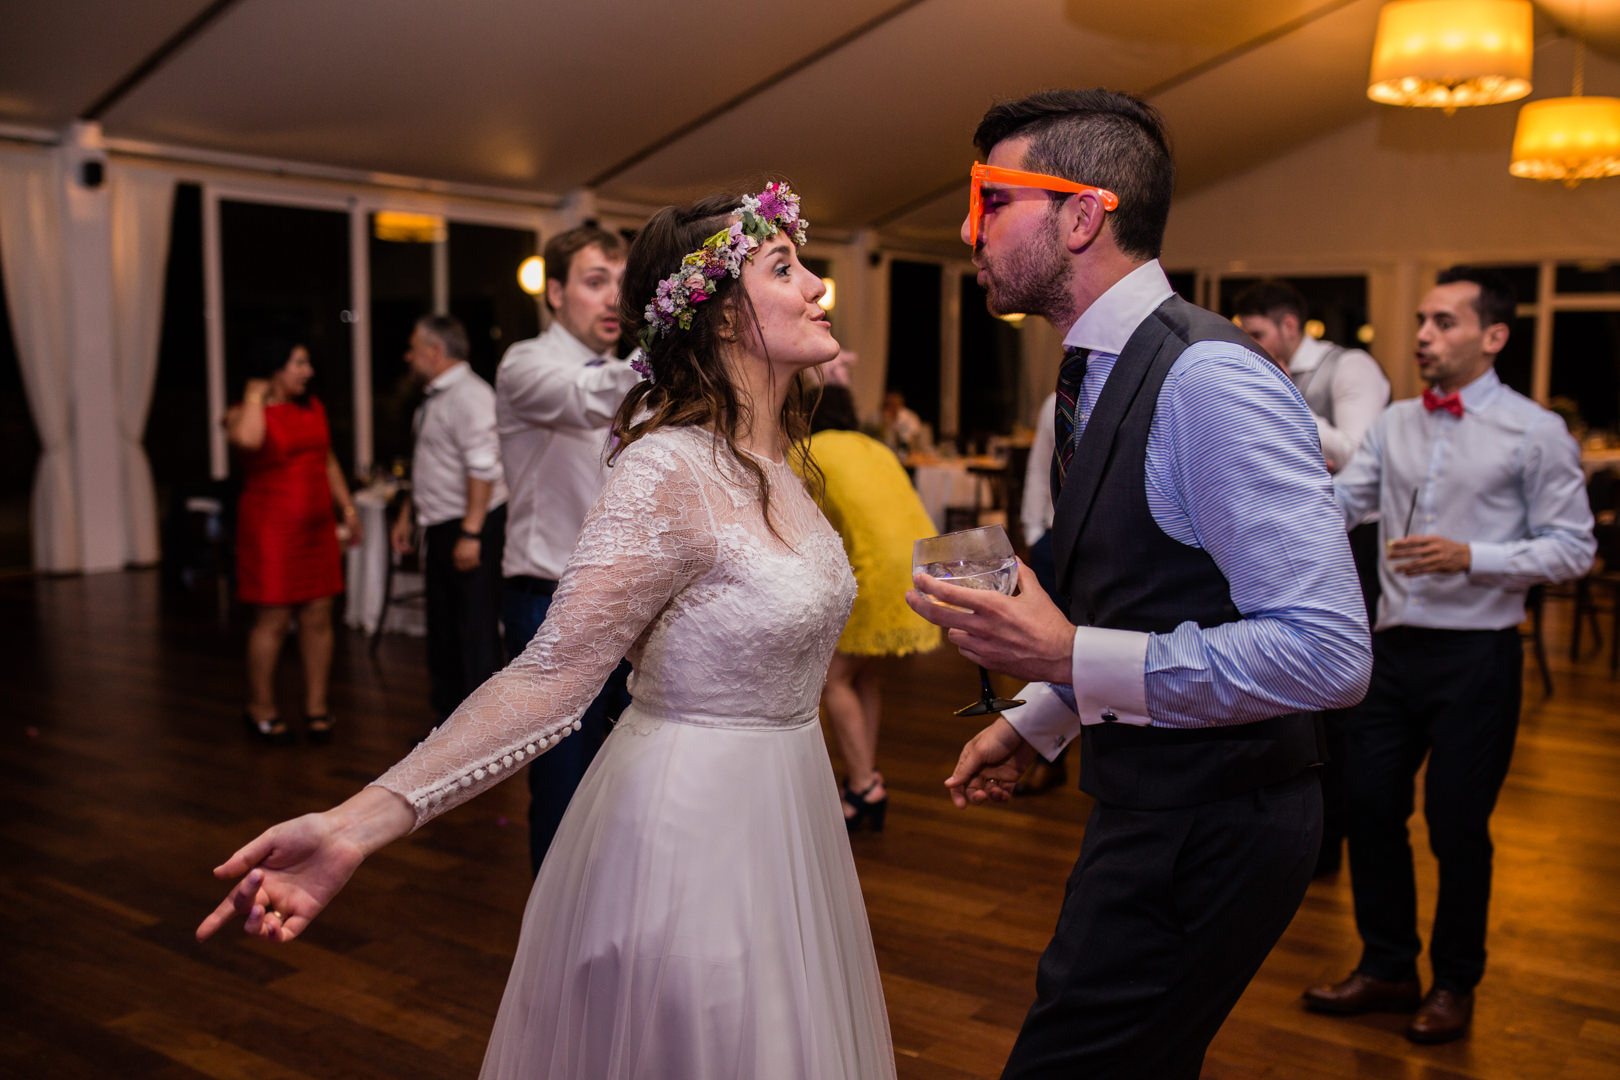 Boda-Lucia-Javi-Lugo-Rafael-Torres-fotografo-bodas-sevilla-madrid-barcelona-wedding-photographer--47.jpg